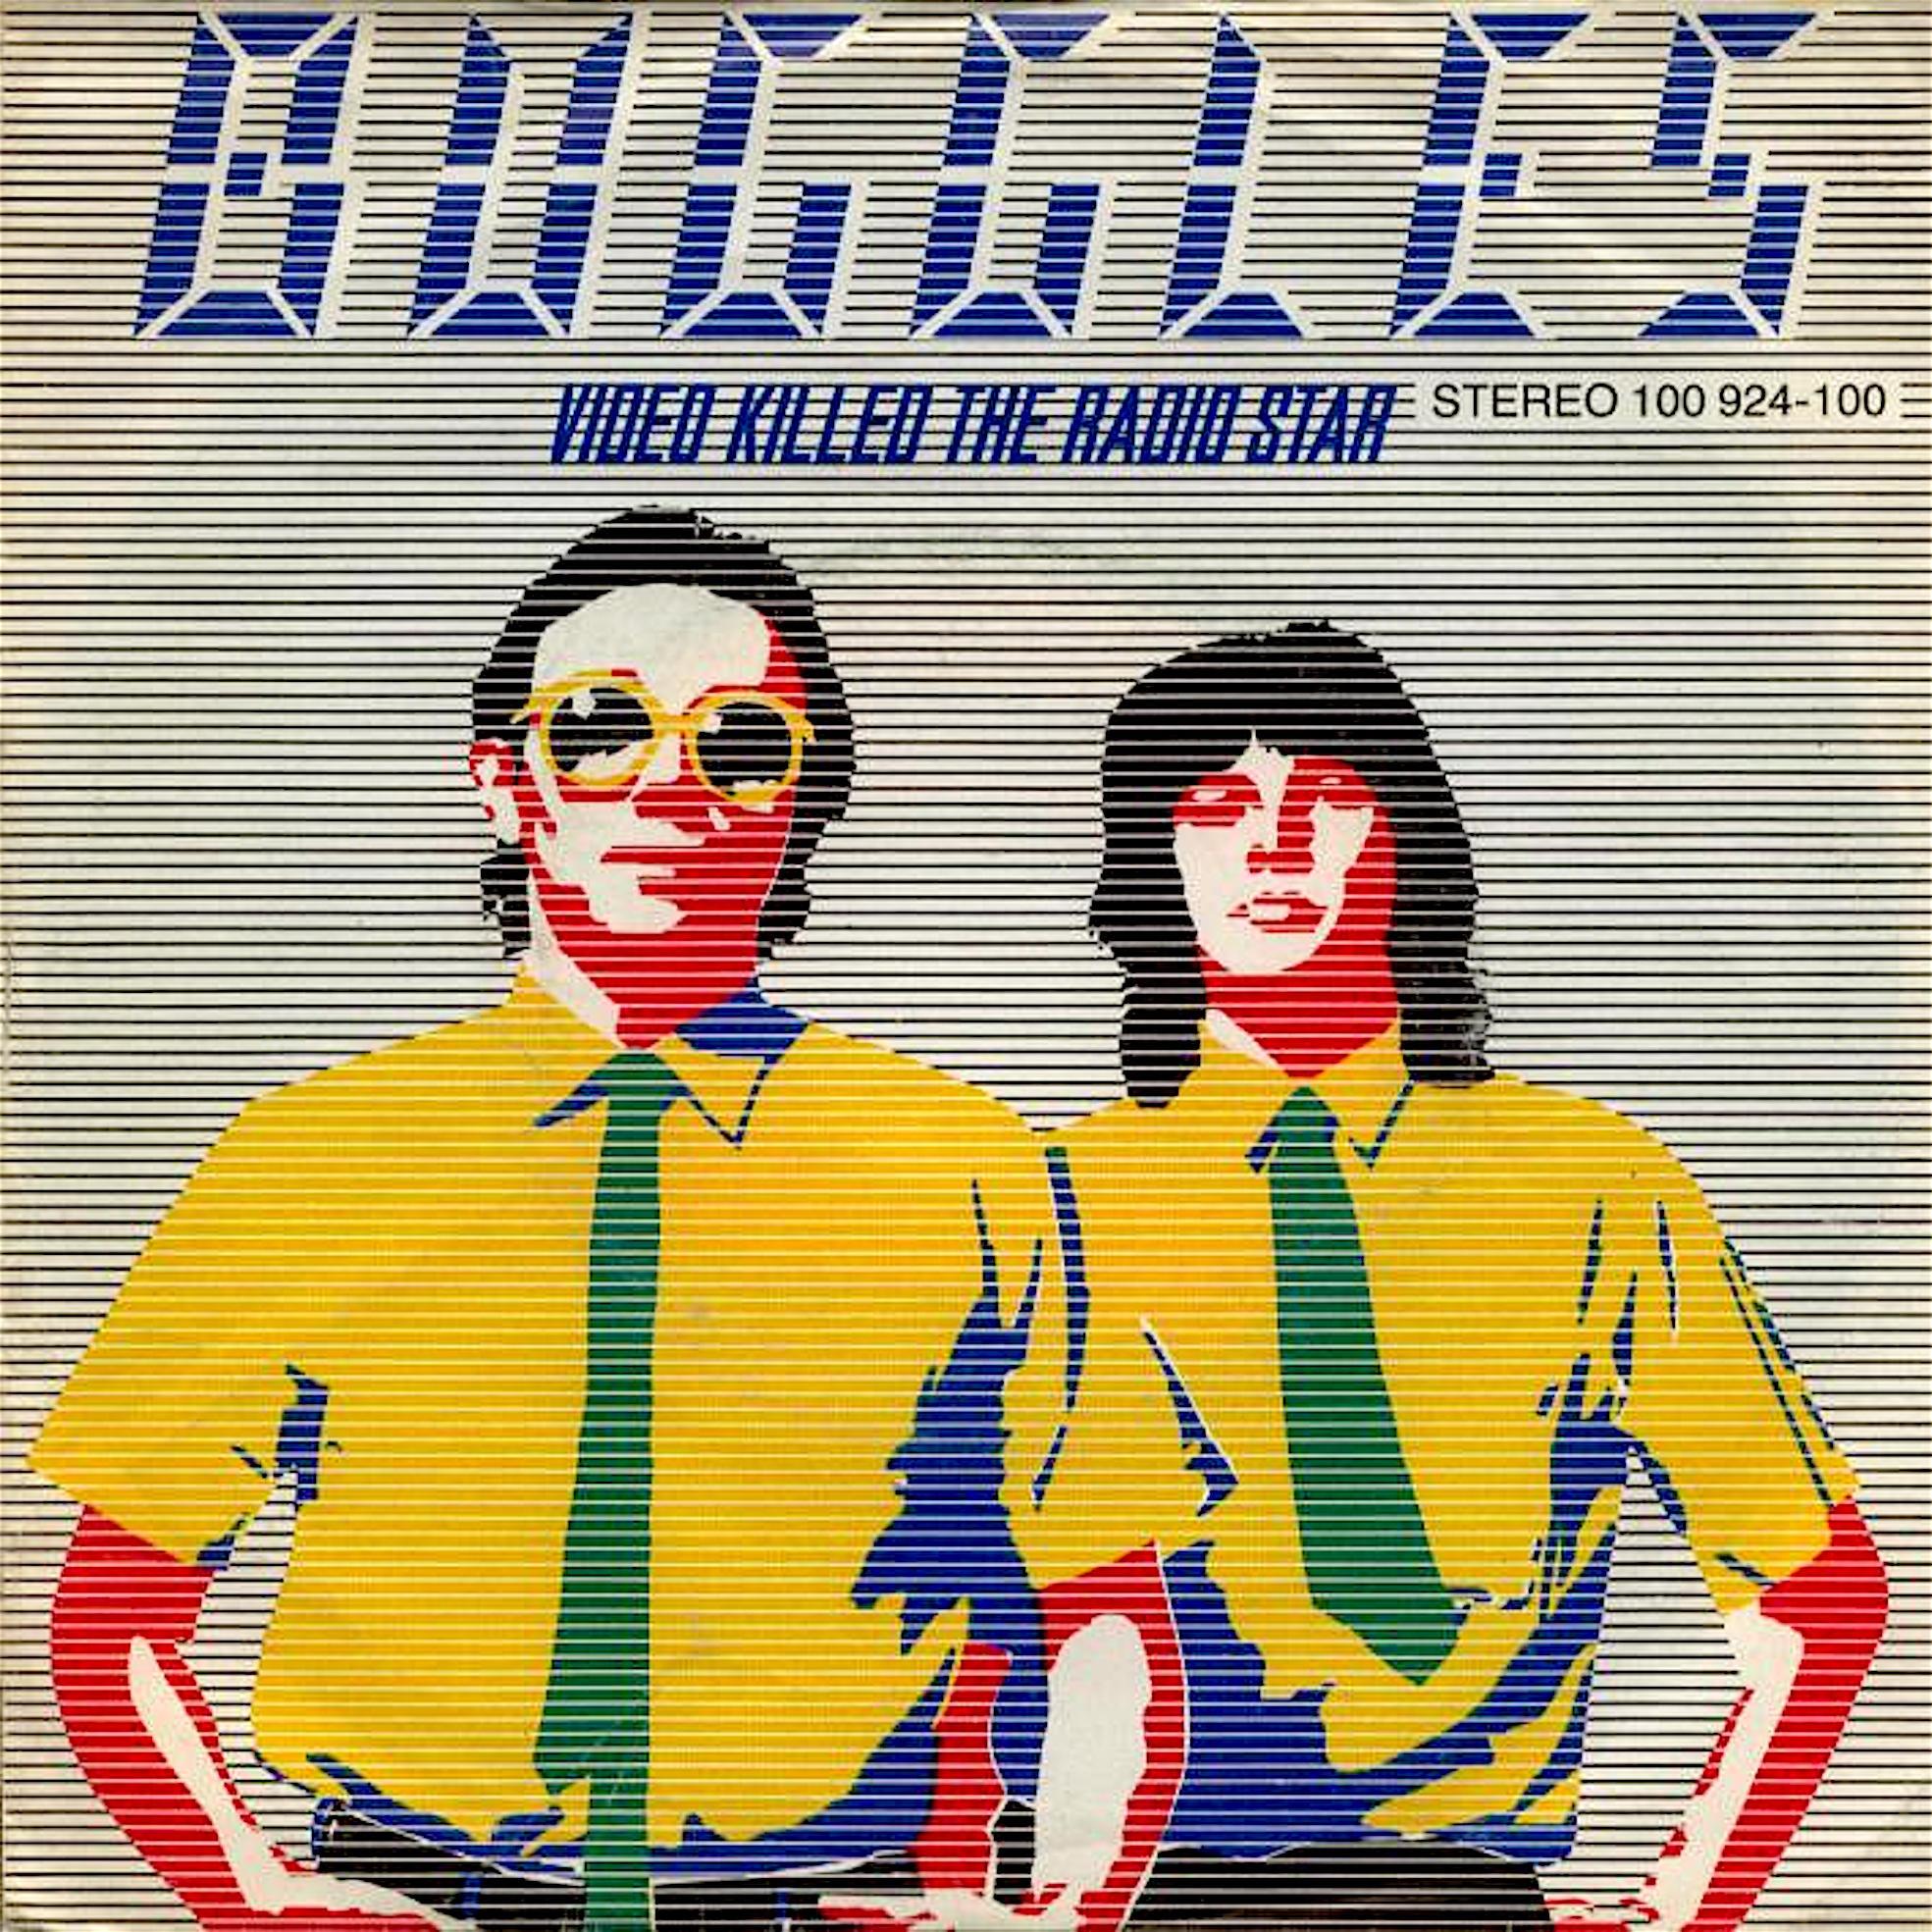 video_killed_the_radio_star_copertina_disco_1979._bugglesjpg